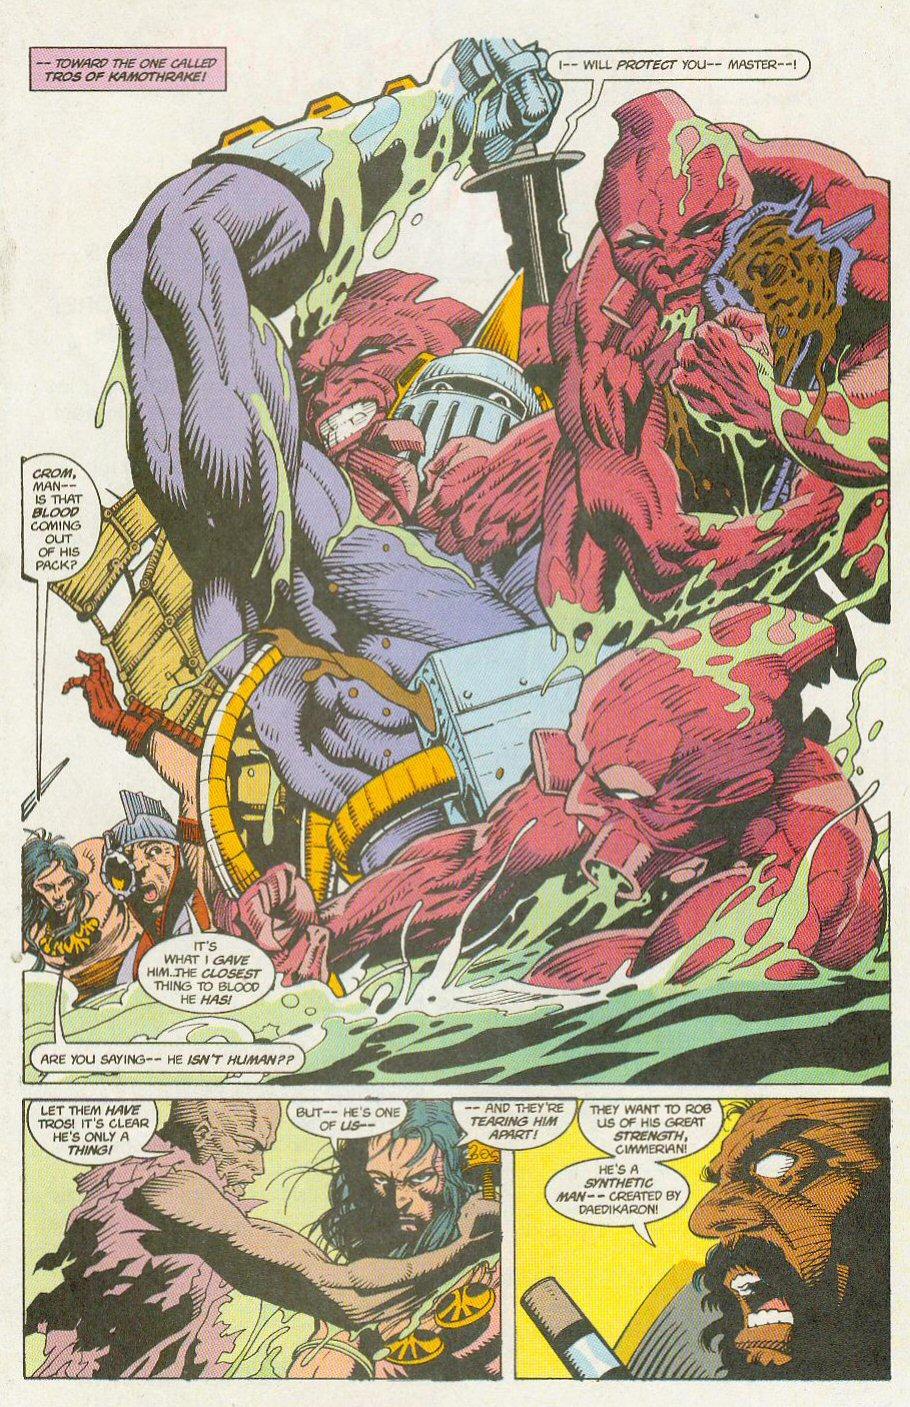 Read online Conan the Adventurer comic -  Issue #13 - 17